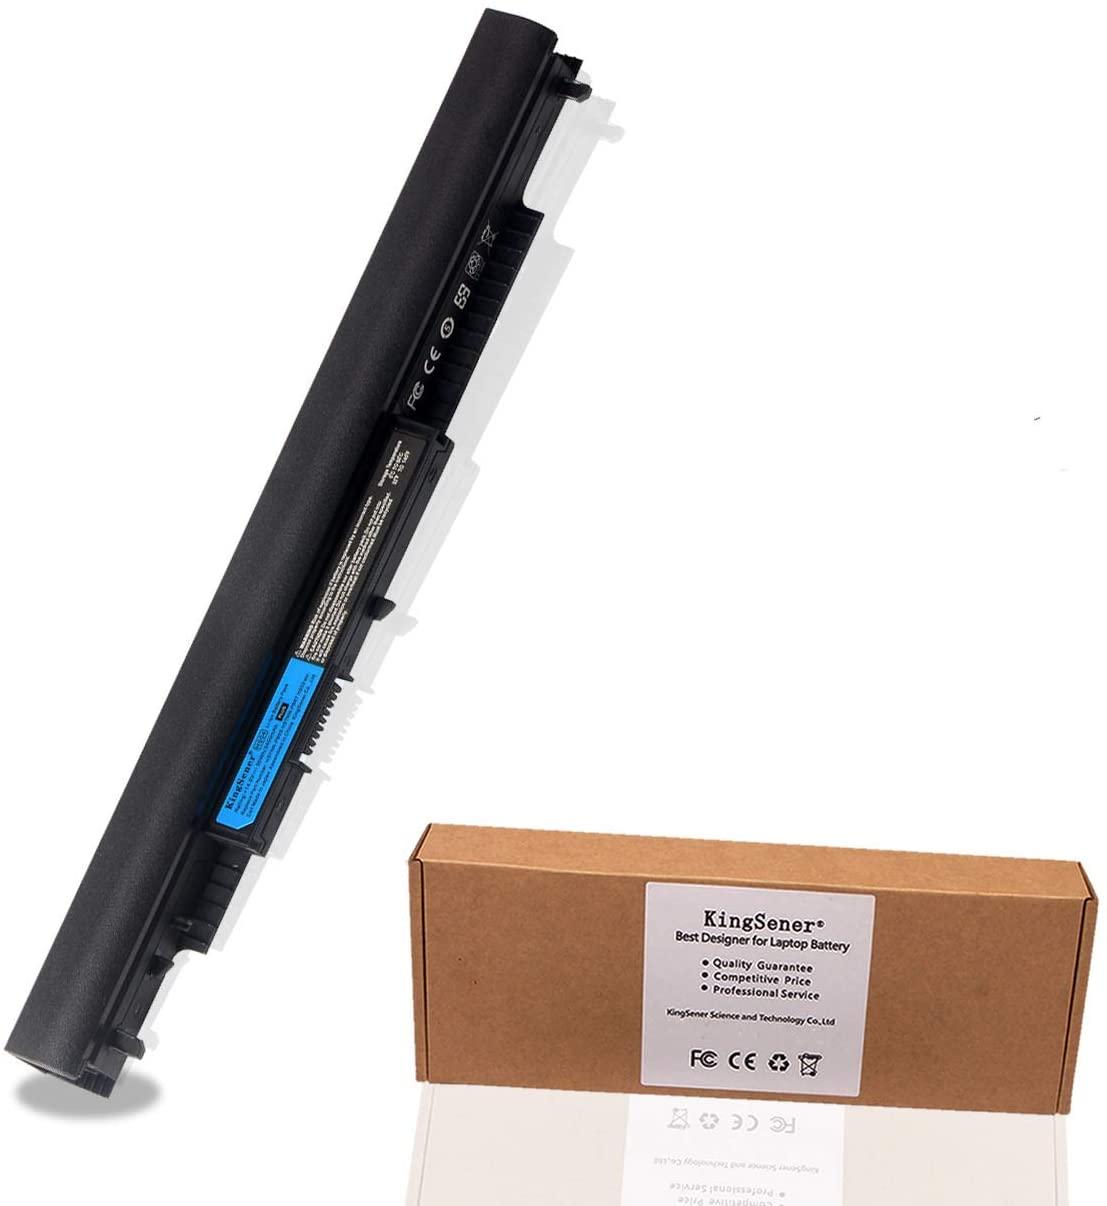 Kingsener Battery HS04 HS03 for HP 240 245 246 250 256 G4, HP Notebook 14 15, HP 807956-001 807957-001 807612-421 HSTNN-LB6U HSTNN-LB6V N2L85AA 807611-421 807611-131 14.8V 50WH/3400mAh